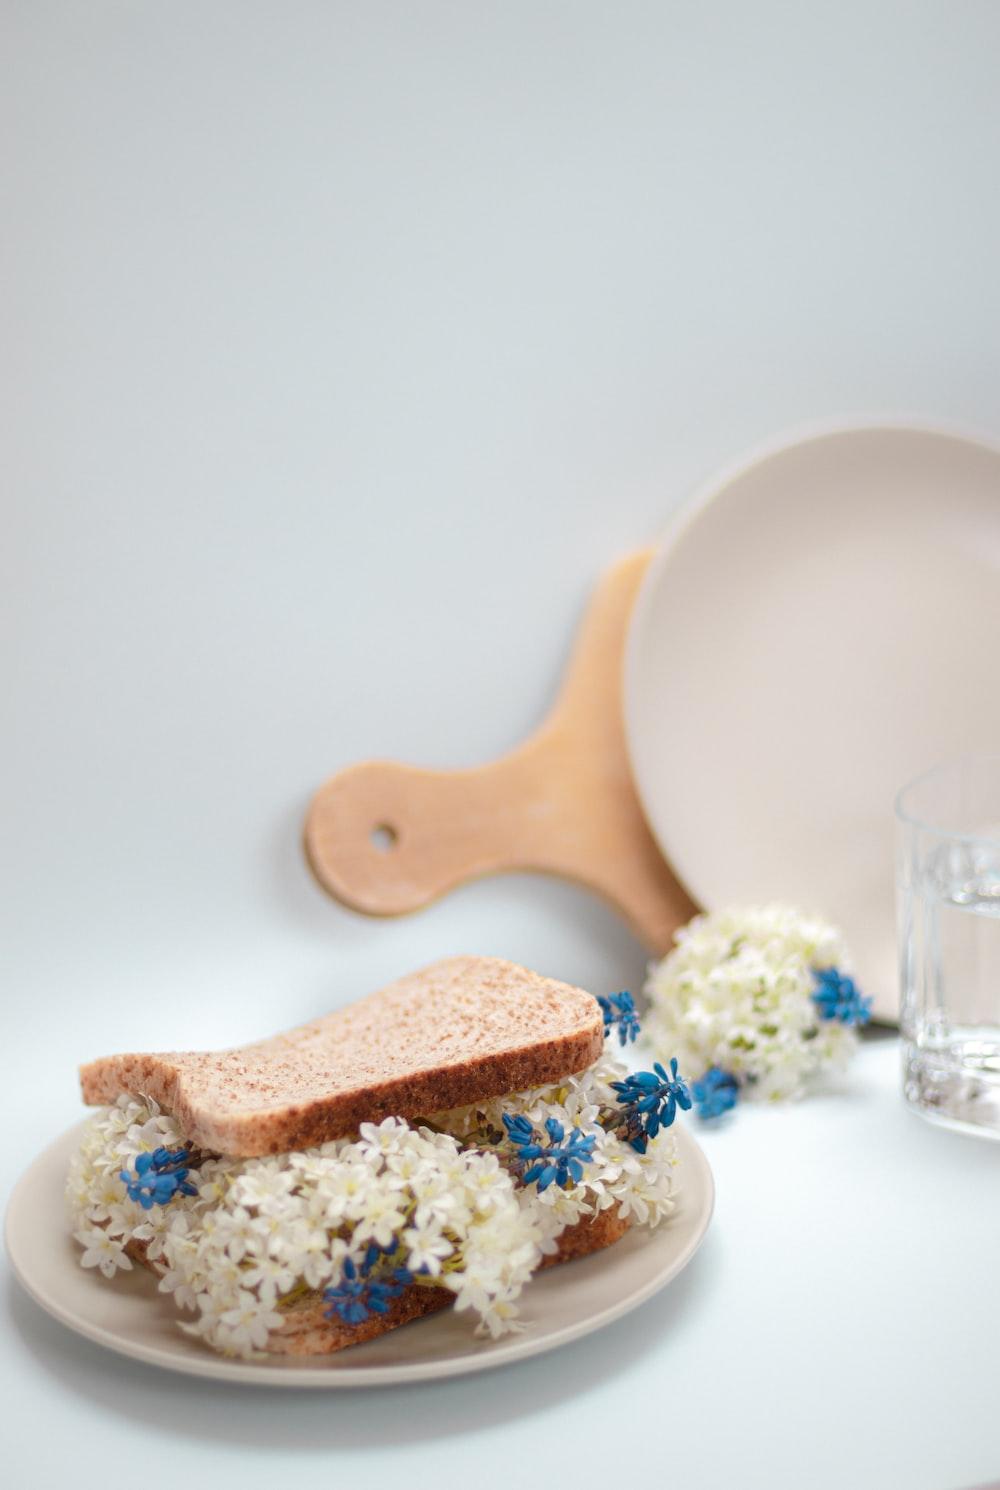 blue and brown ceramic egg figurine